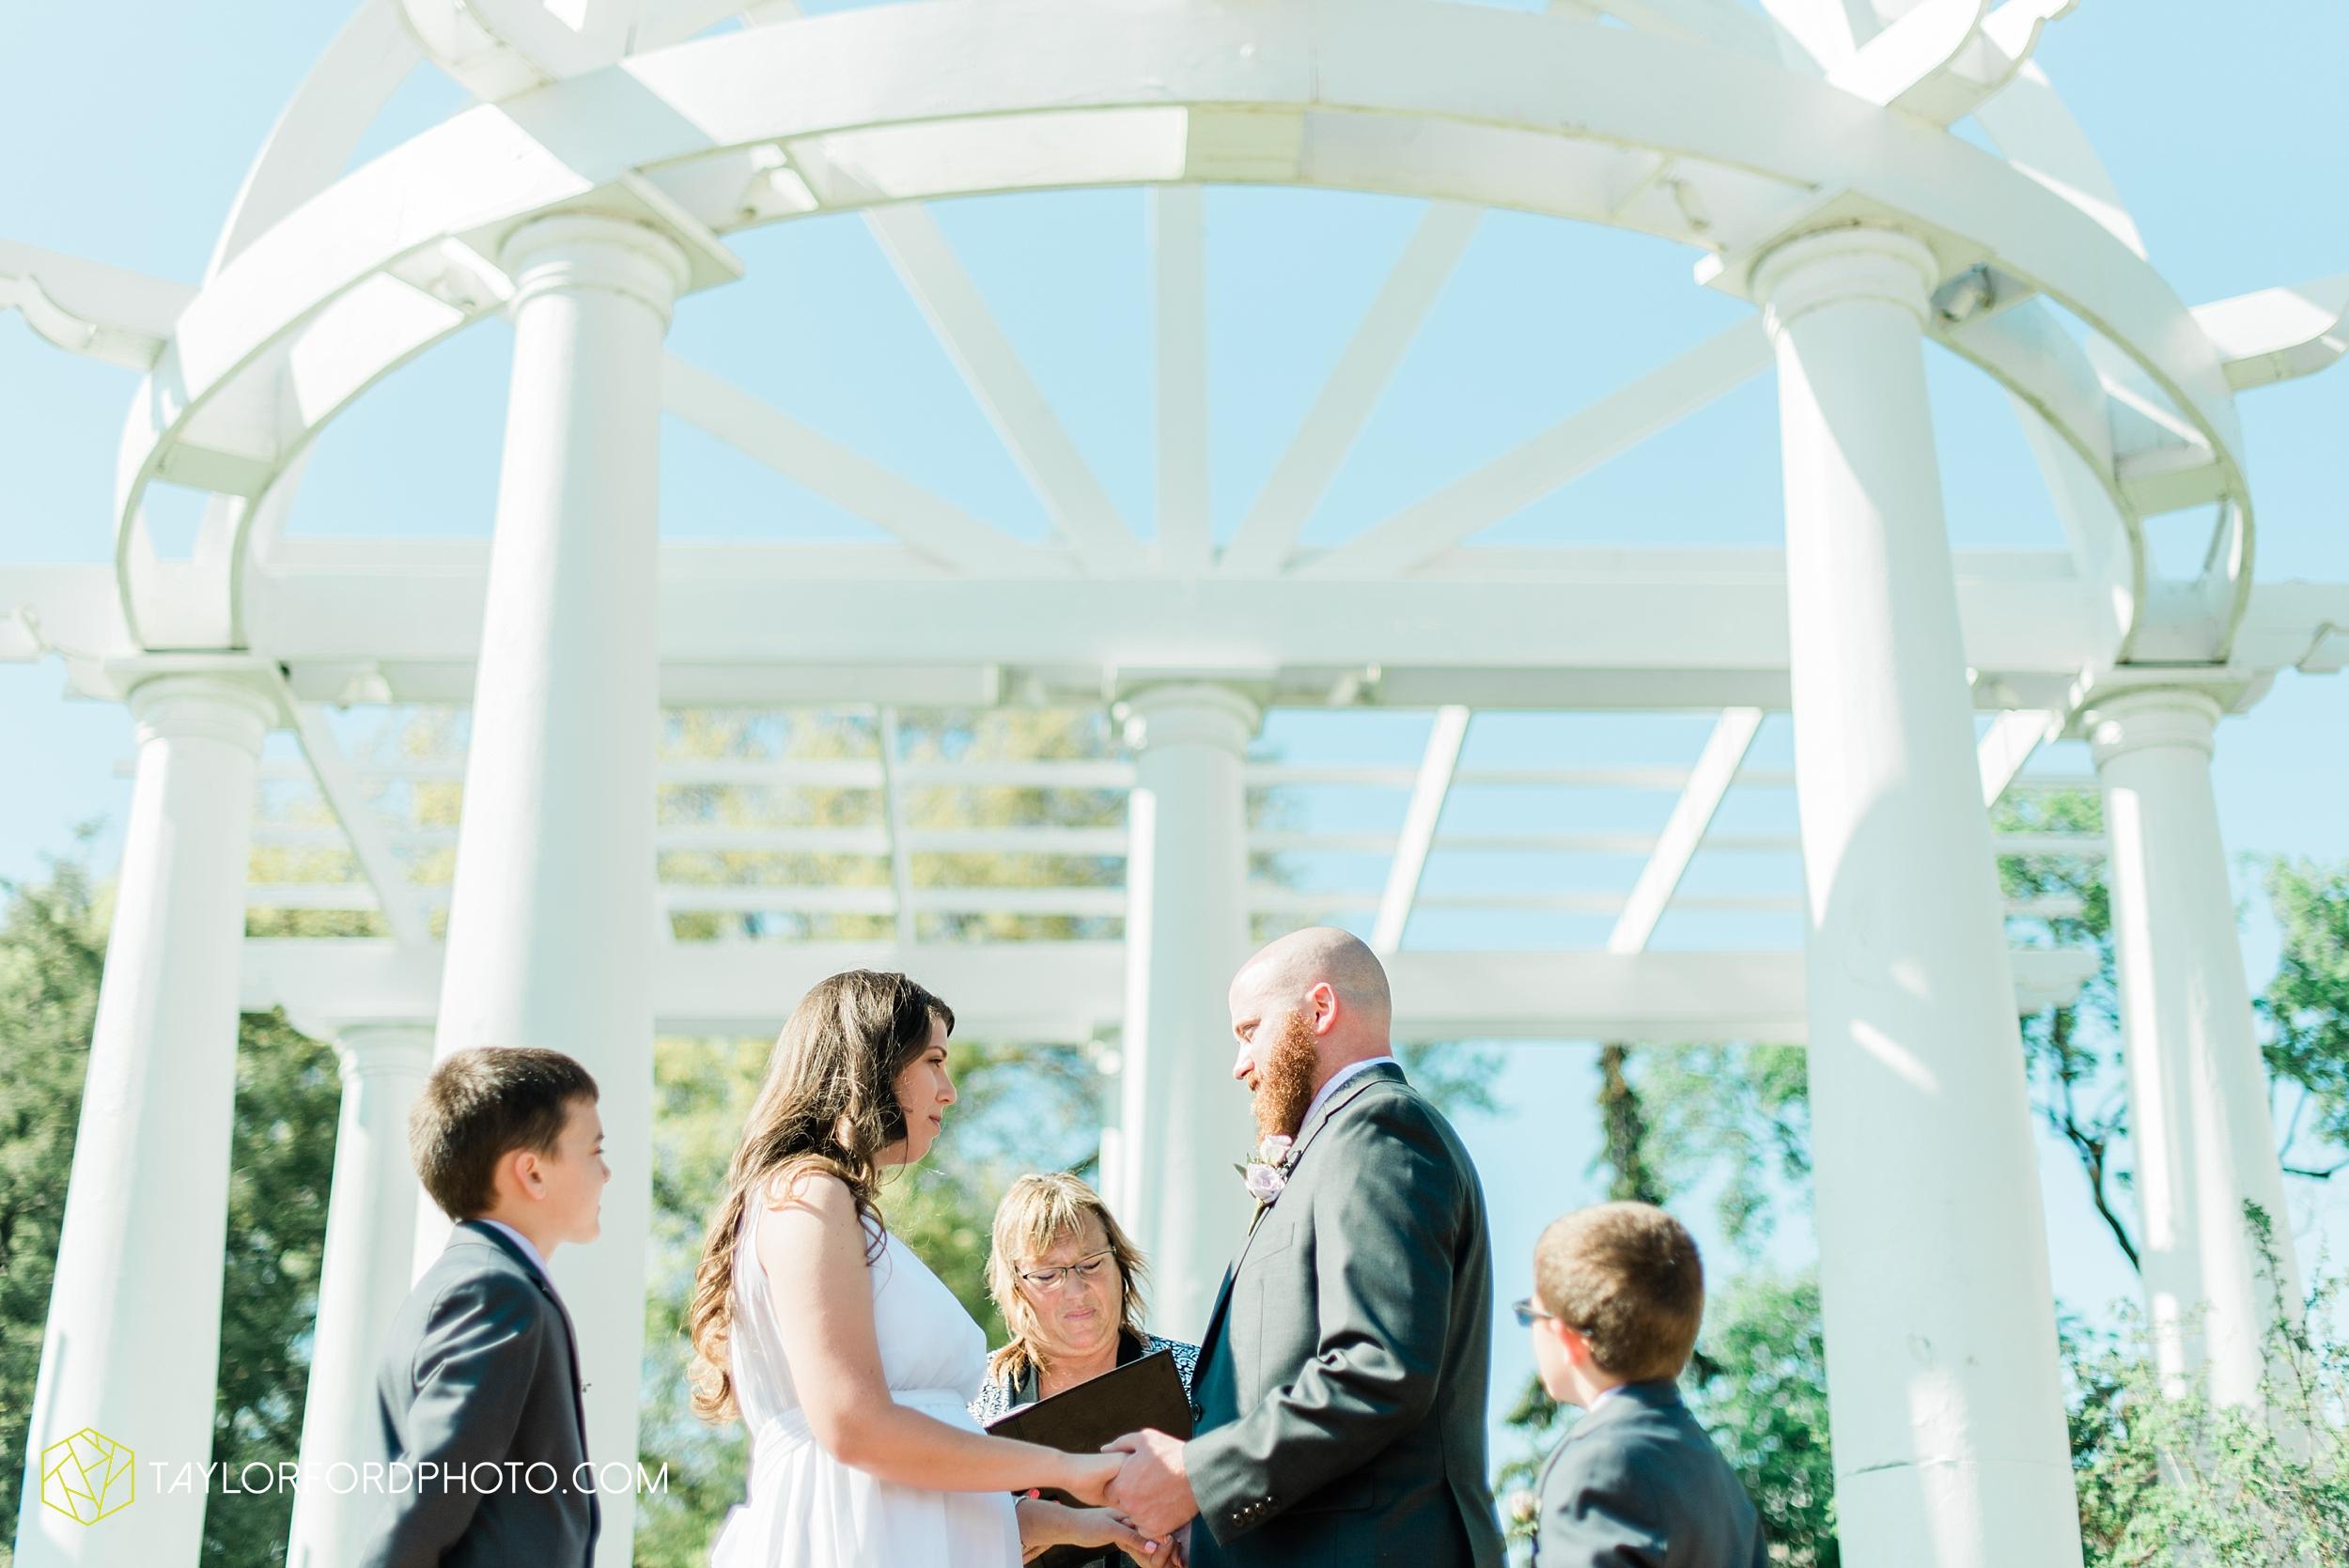 lakeside-rose-gardens-fort-wayne-indiana-elopement-wedding-photographer-Taylor-Ford-Photography_7148.jpg